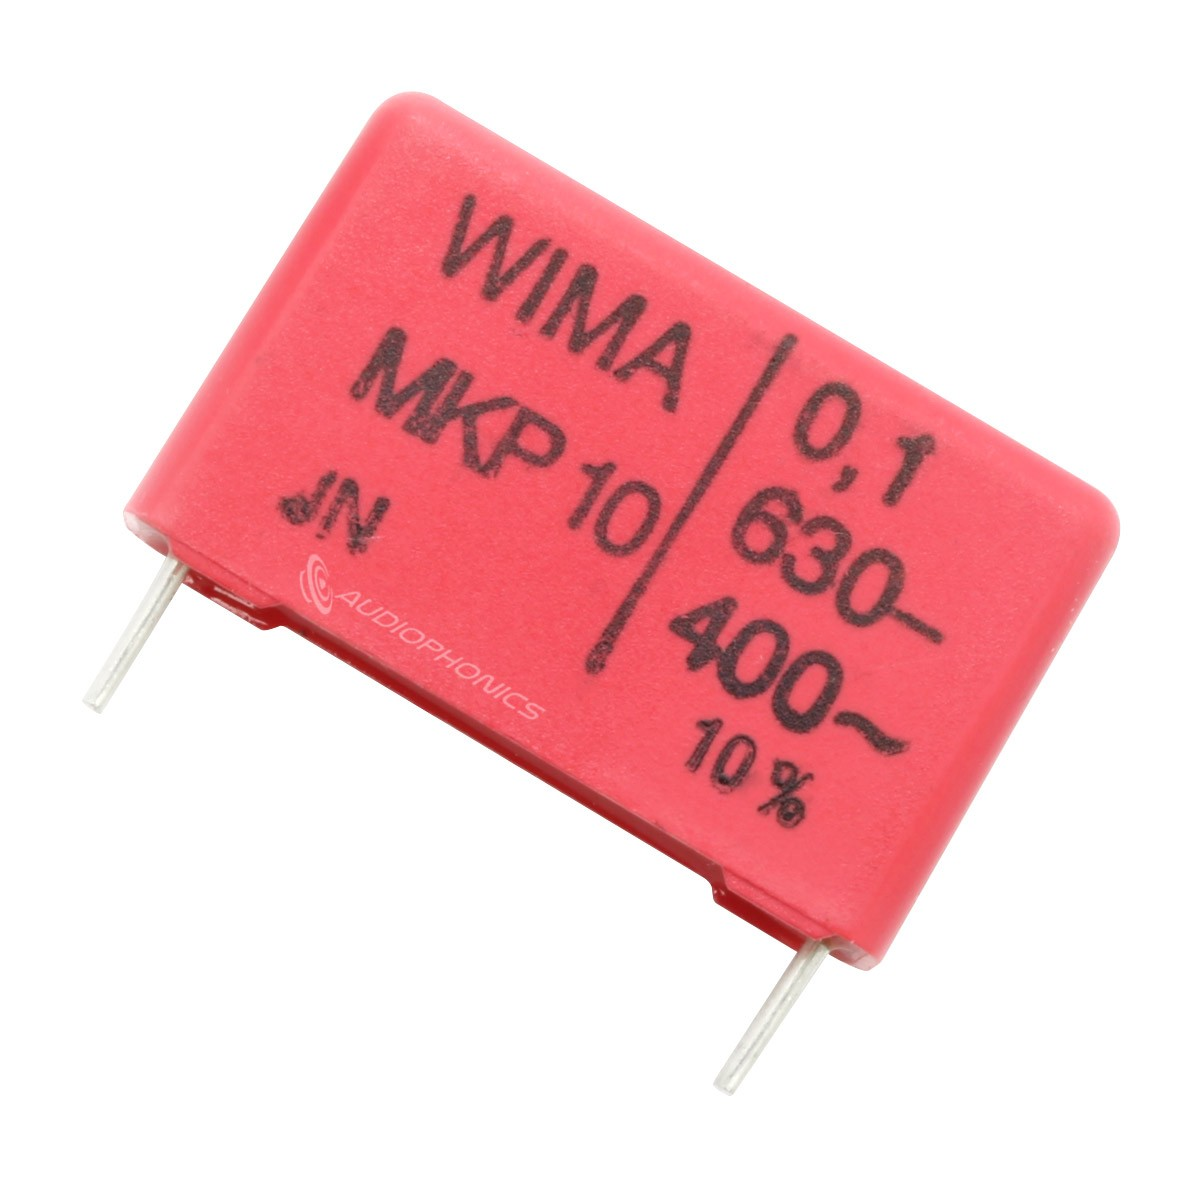 WIMA MKP 10 Condensateur Polyester 27,5mm 250V 2.2µF